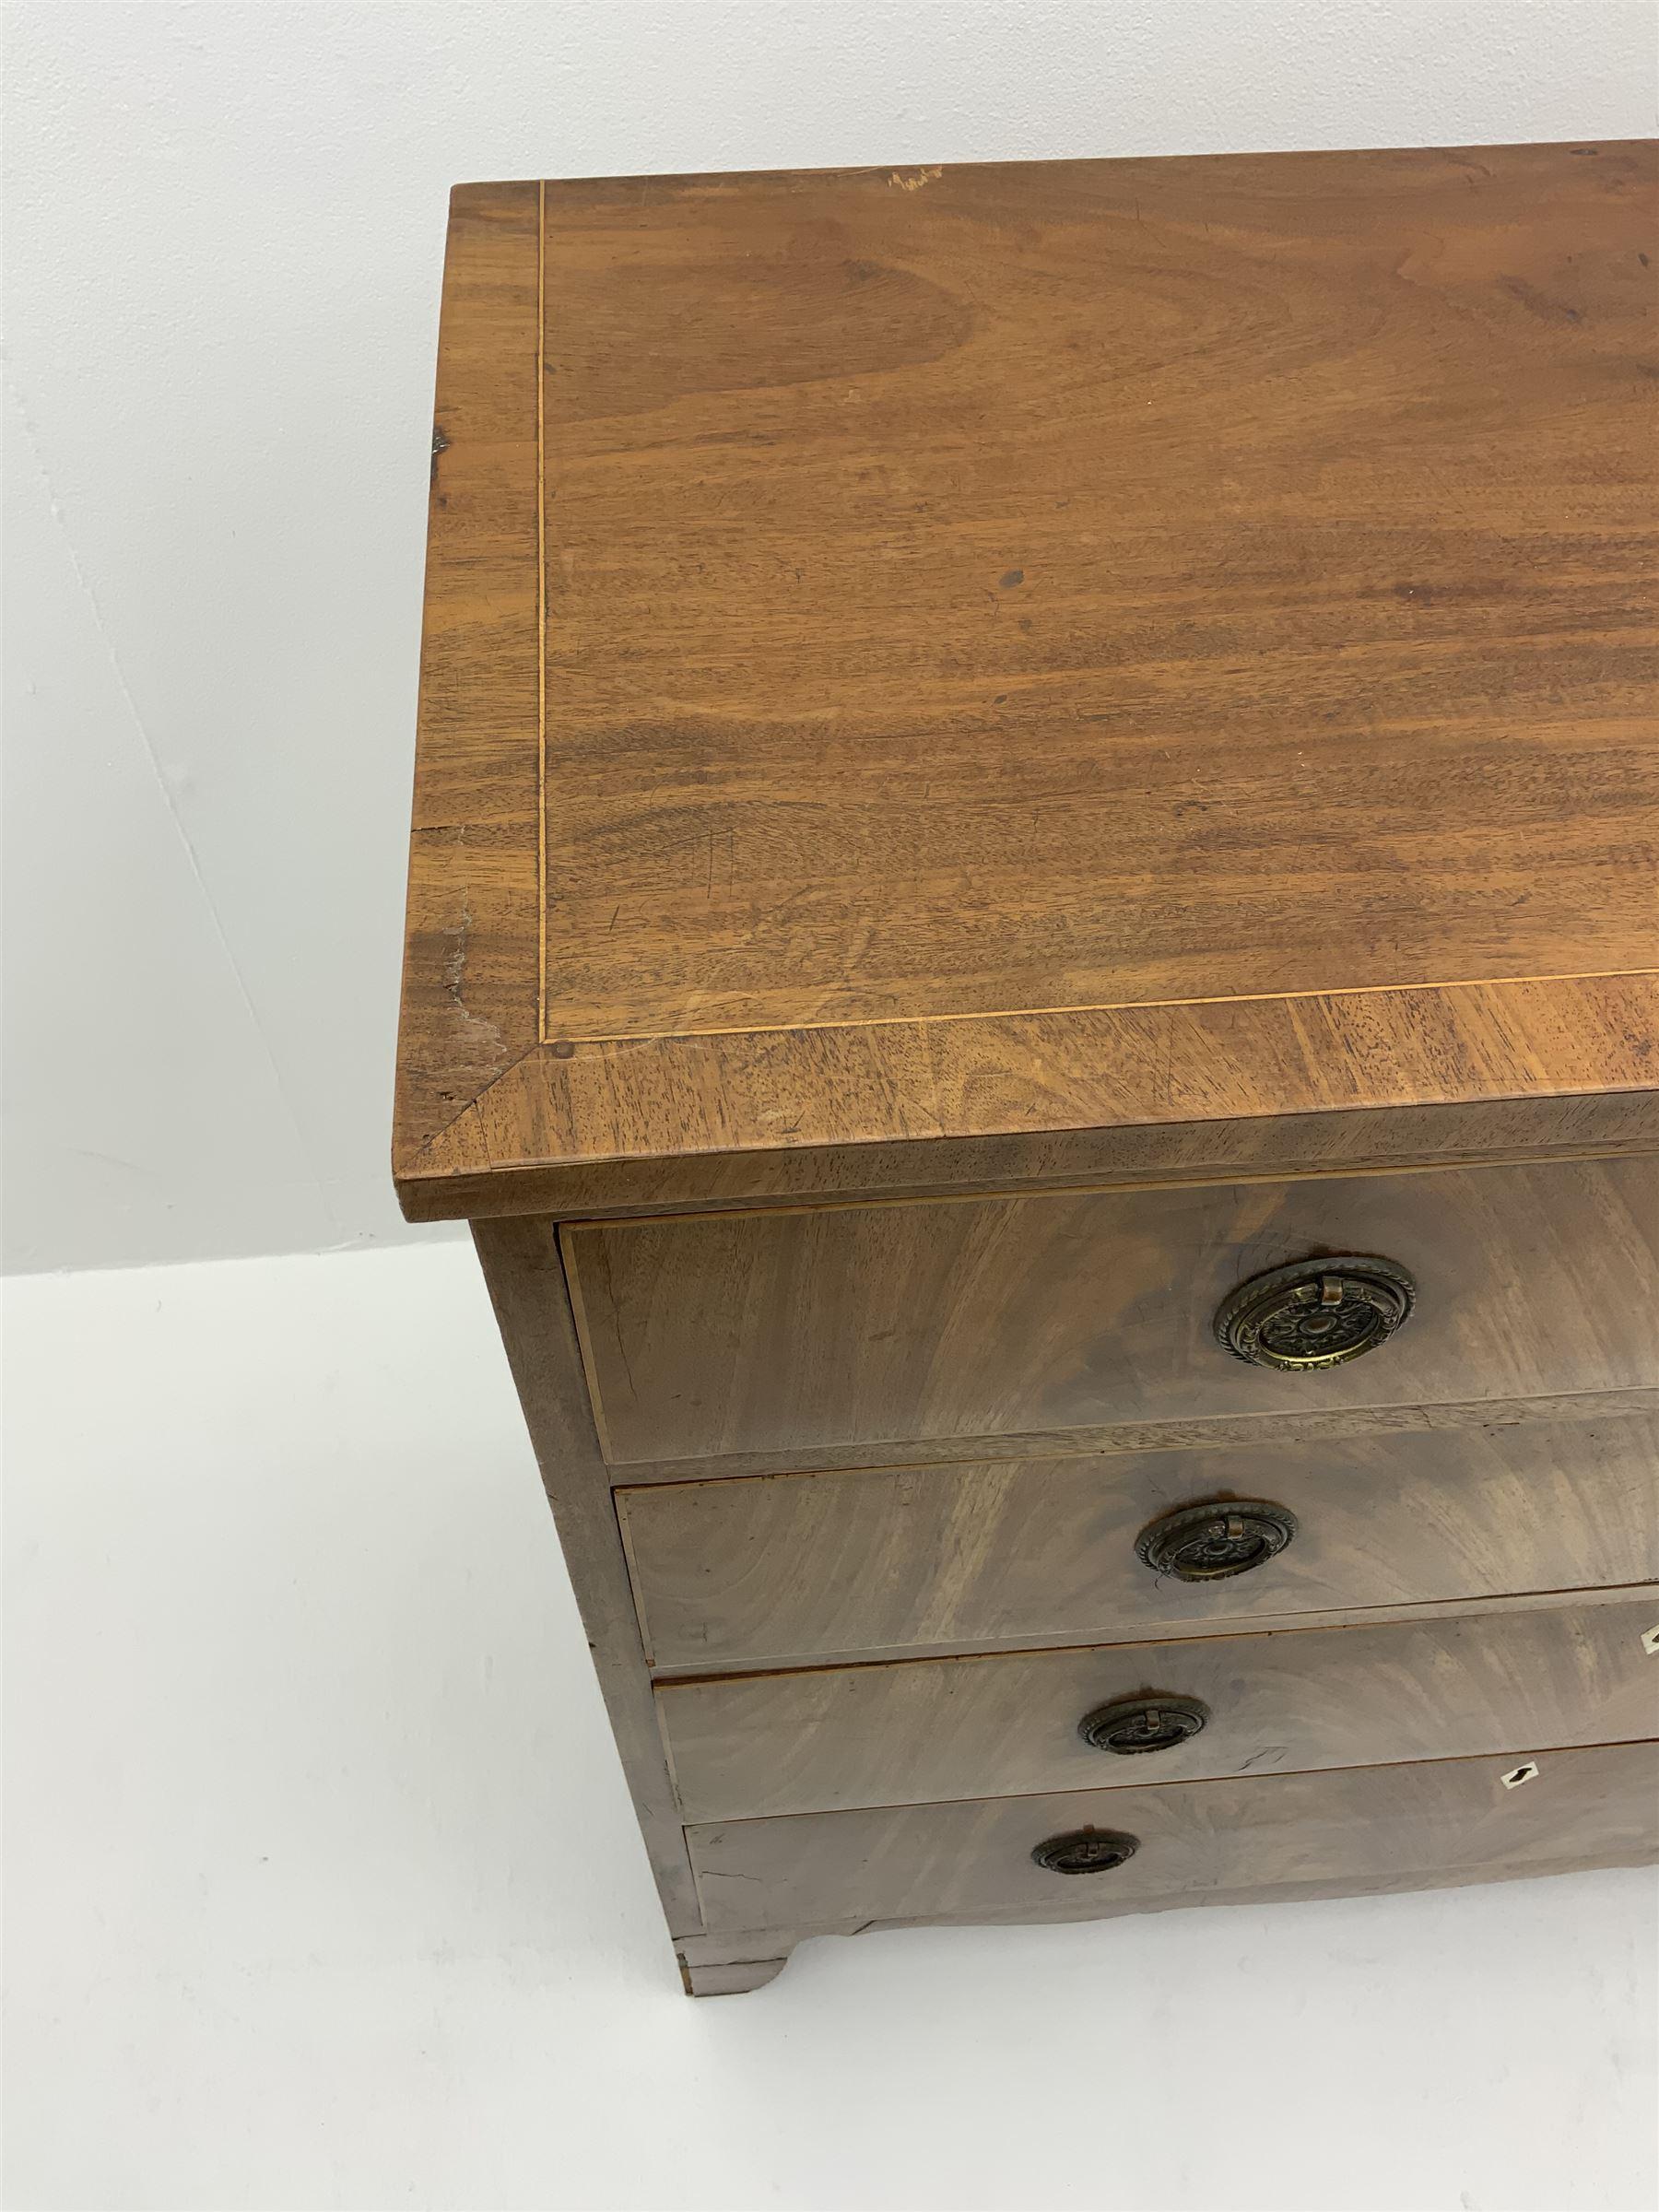 George III inlaid mahogany chest - Image 3 of 3